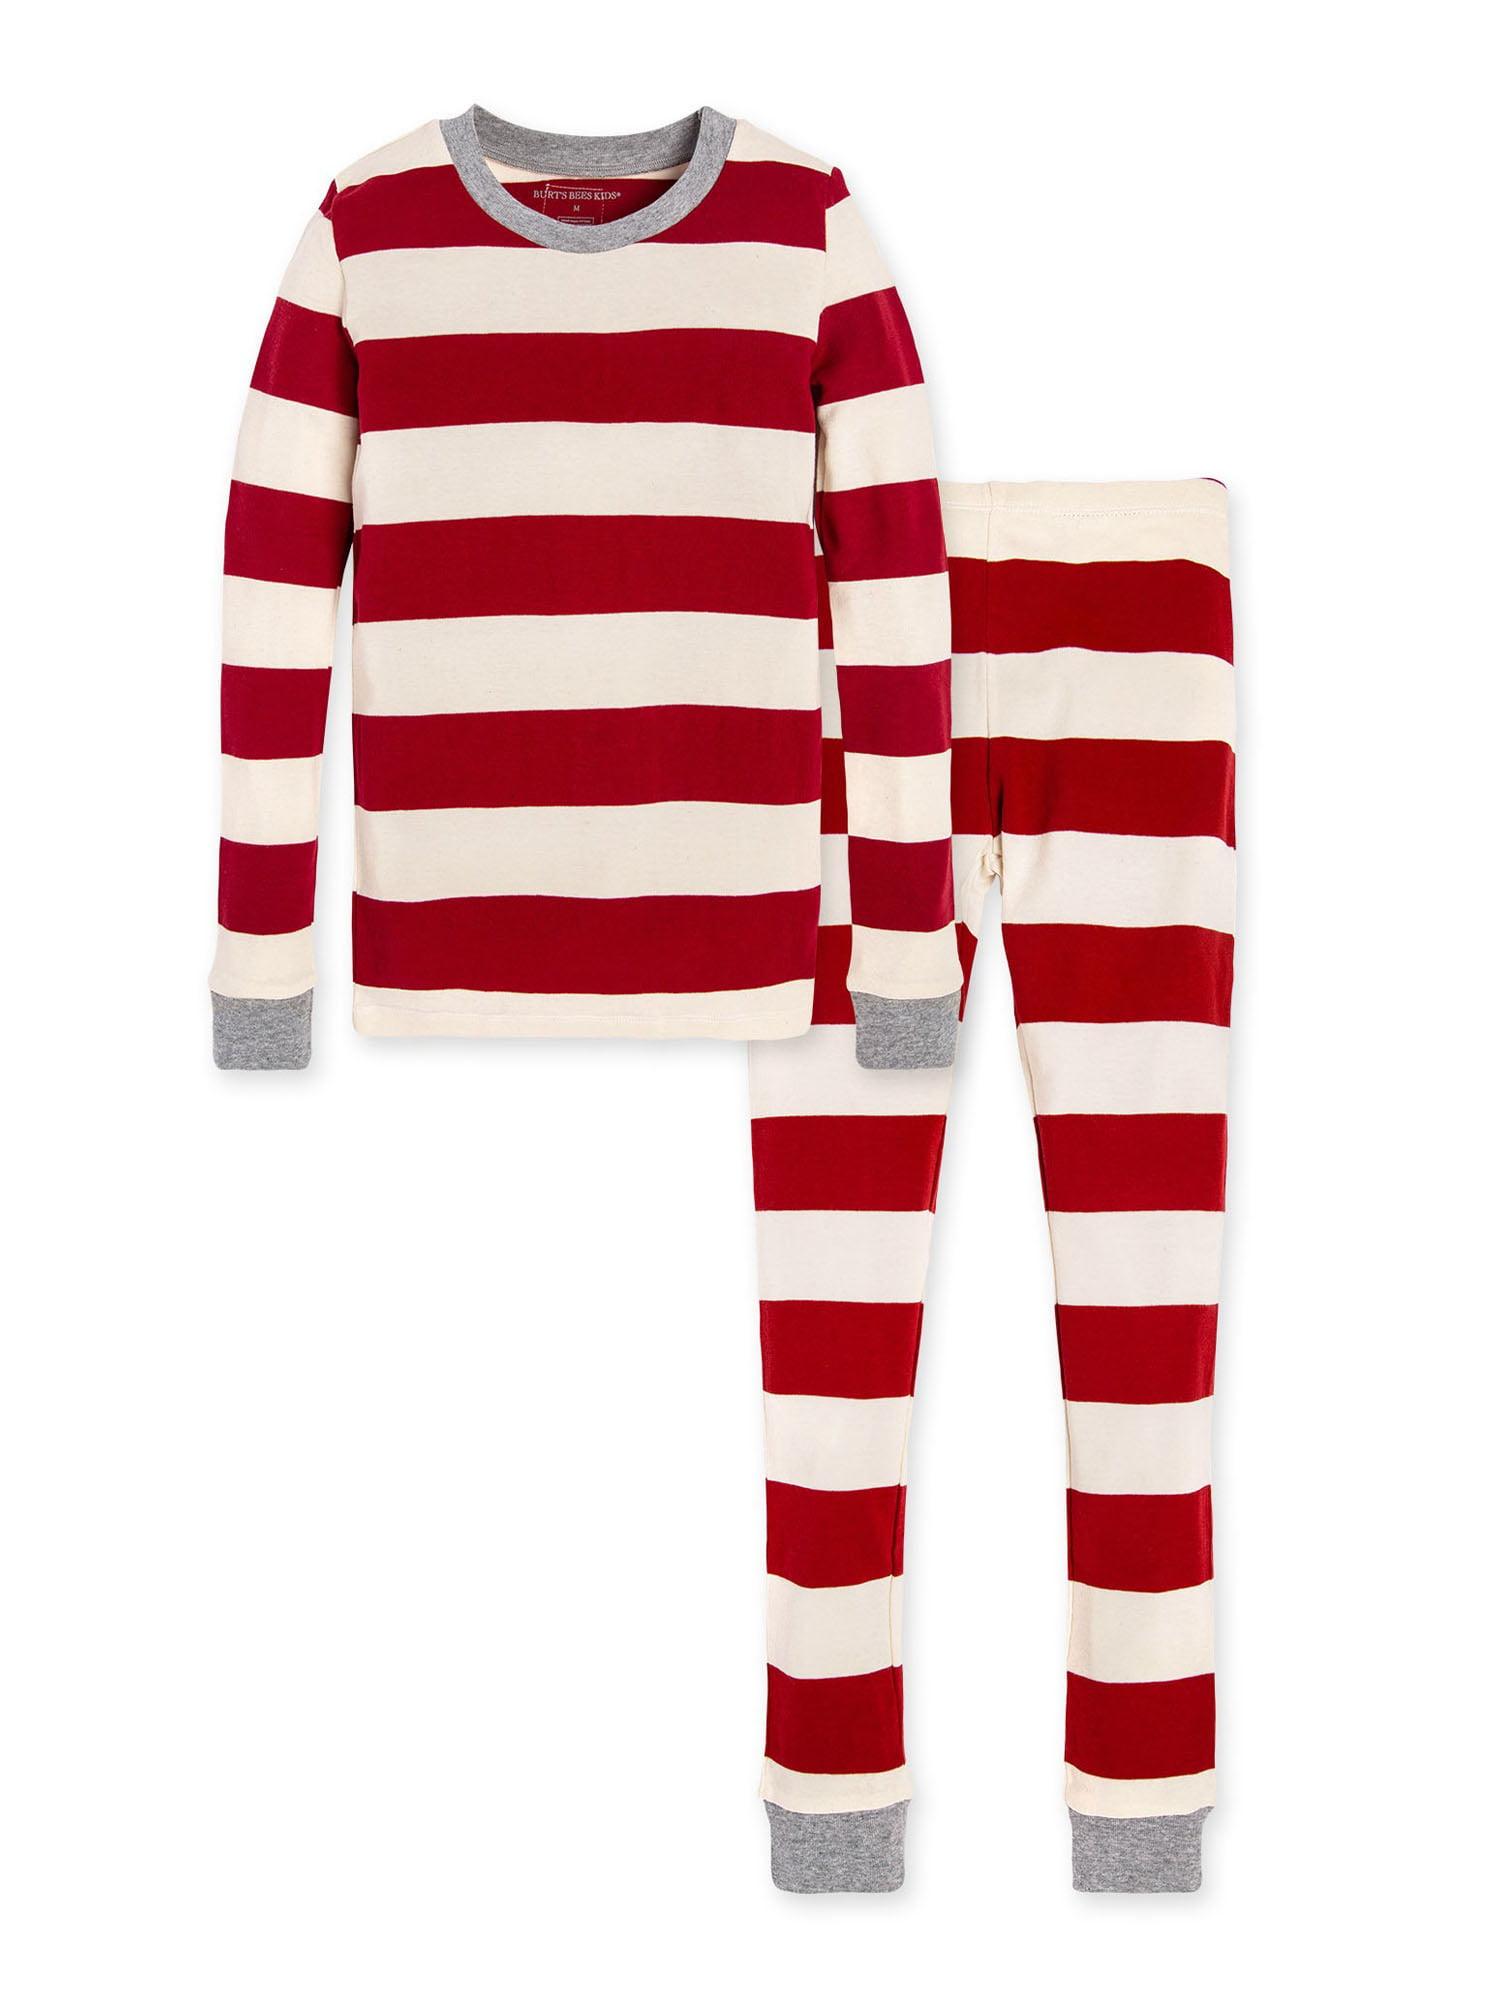 classic striped pyjamas in long & regular leg by pj pan